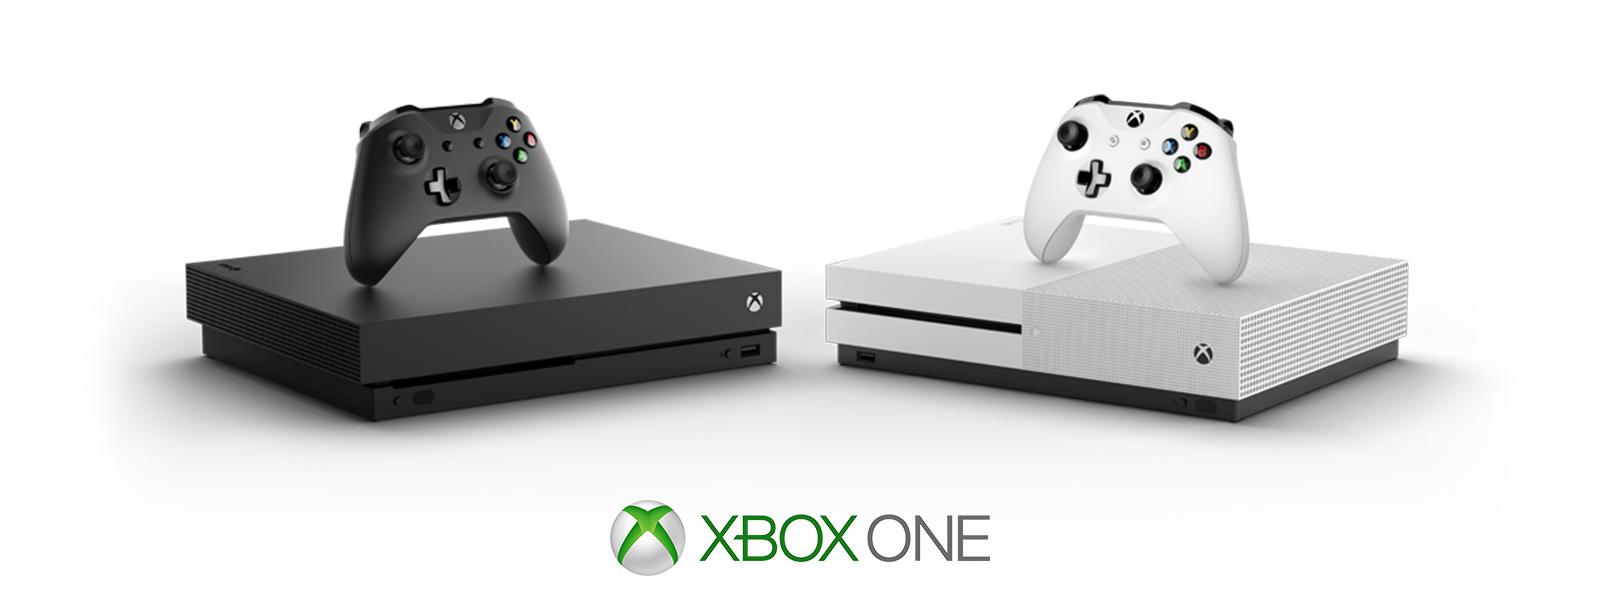 Xbox One X és Xbox One S